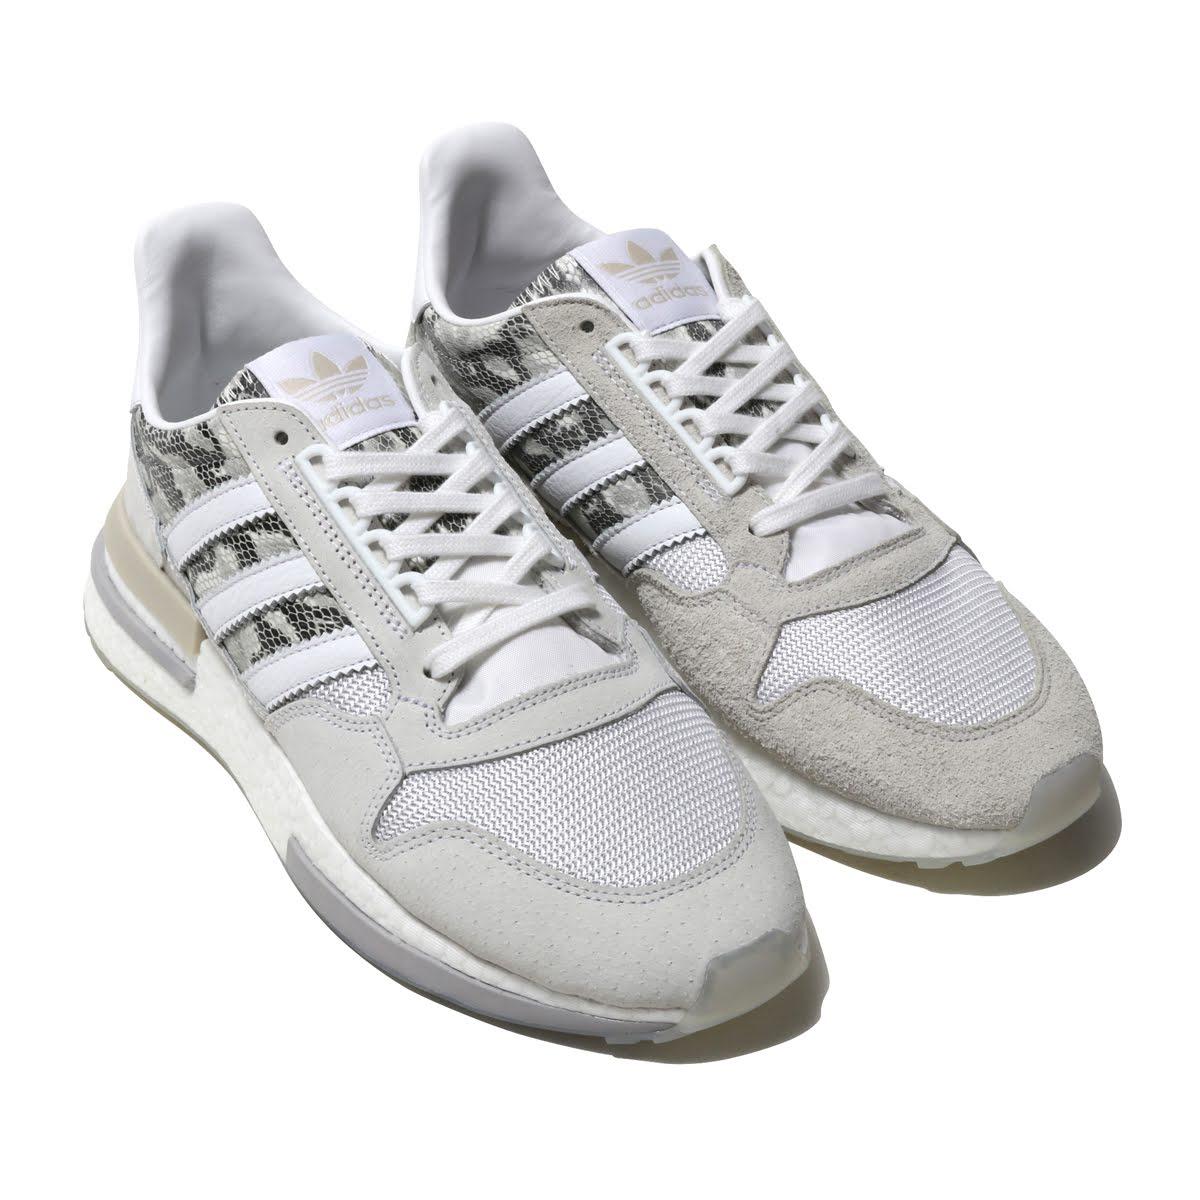 adidas Originals ZX 500 RM(アディダスオリジナルス ZX 500 RM)RUNNING WHITE/RUNNING WHITE/RUNNING WHITE【メンズ レディース スニーカー】19SS-I